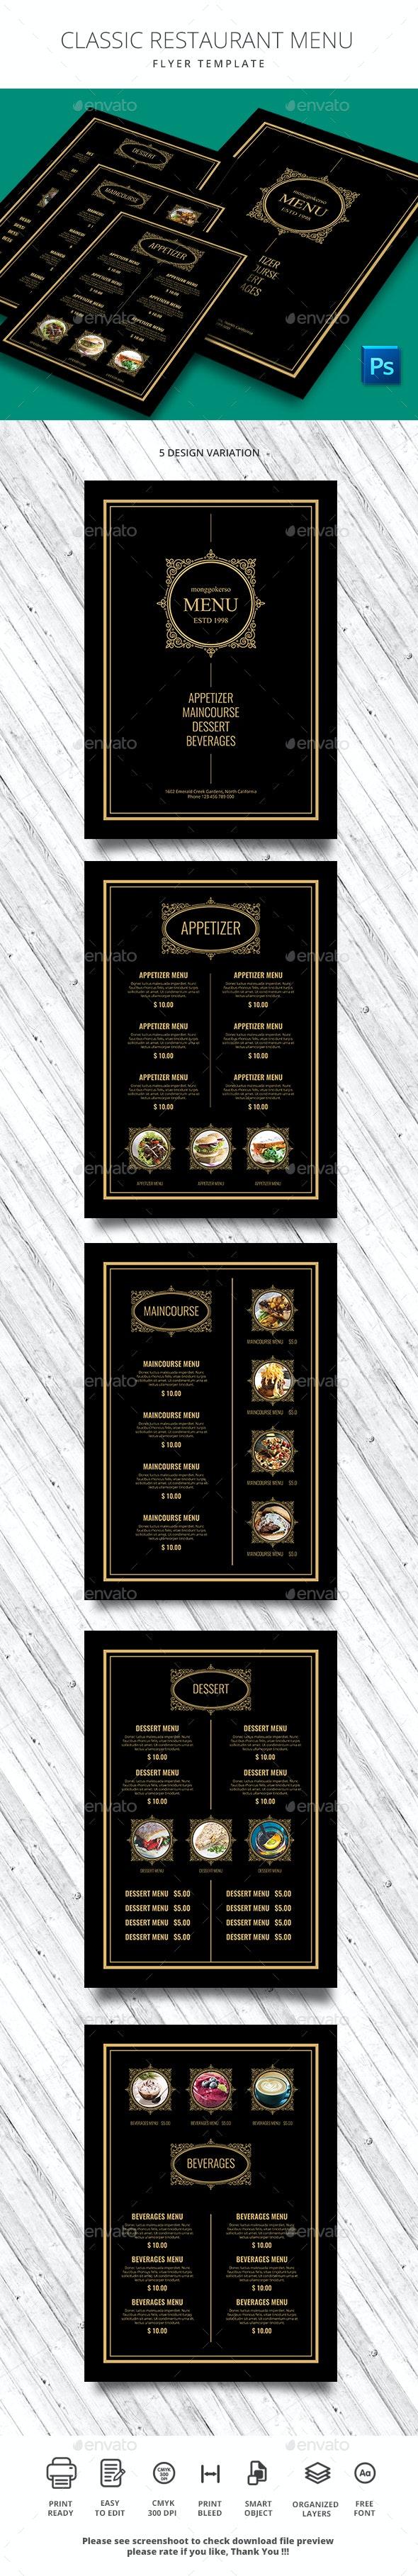 Classic Restaurant Menu - Food Menus Print Templates